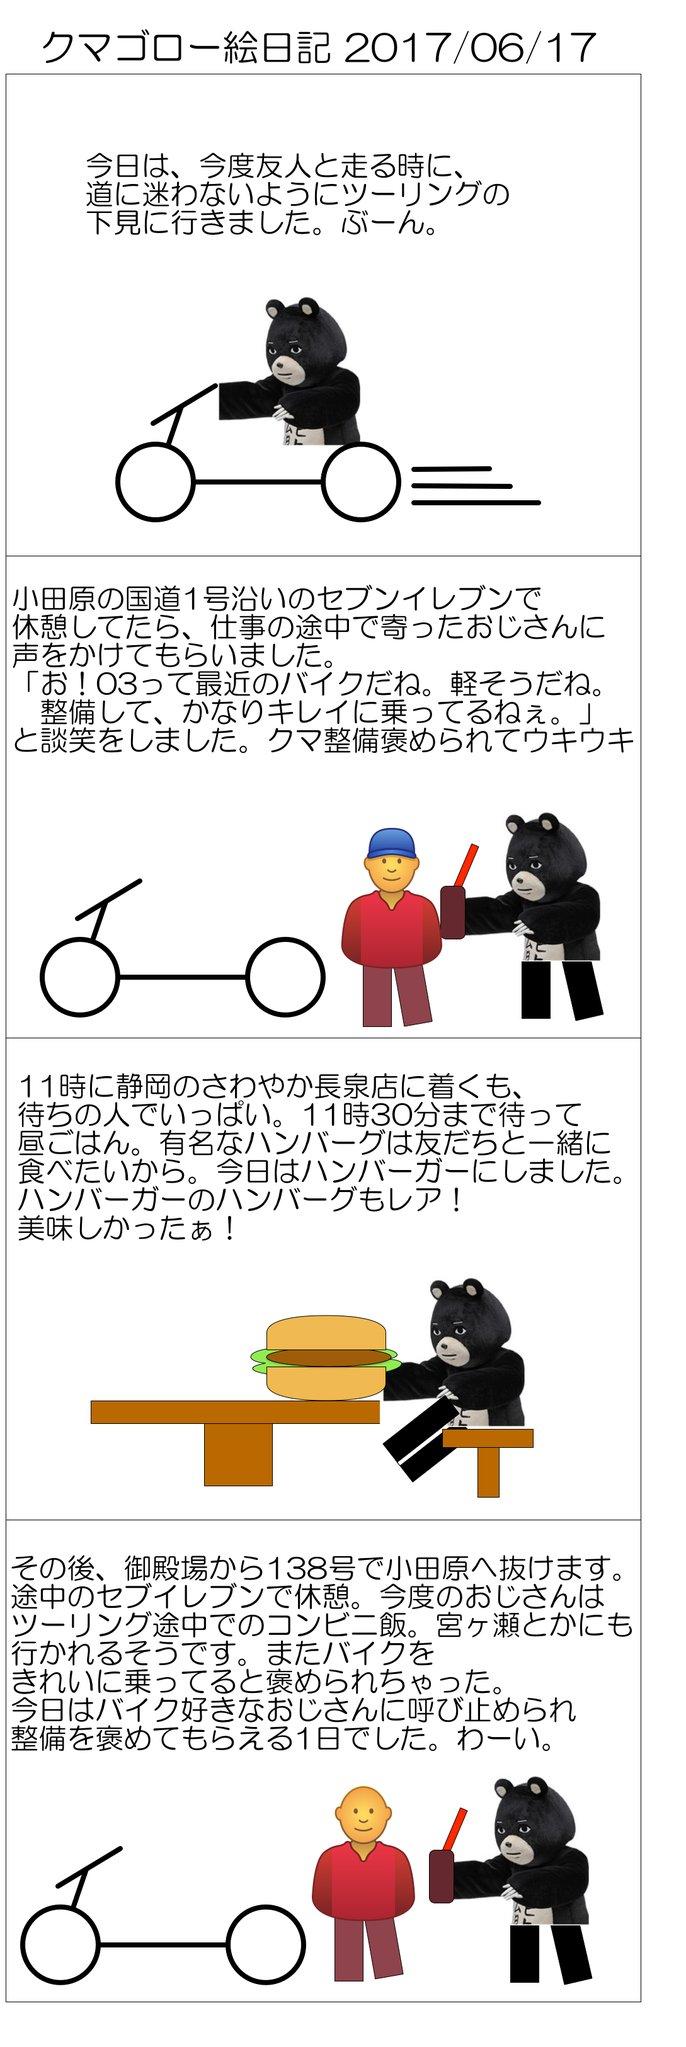 https://cdn-ak2.f.st-hatena.com/images/fotolife/k/kumagoro_bike/20170629/20170629064255_original.jpg